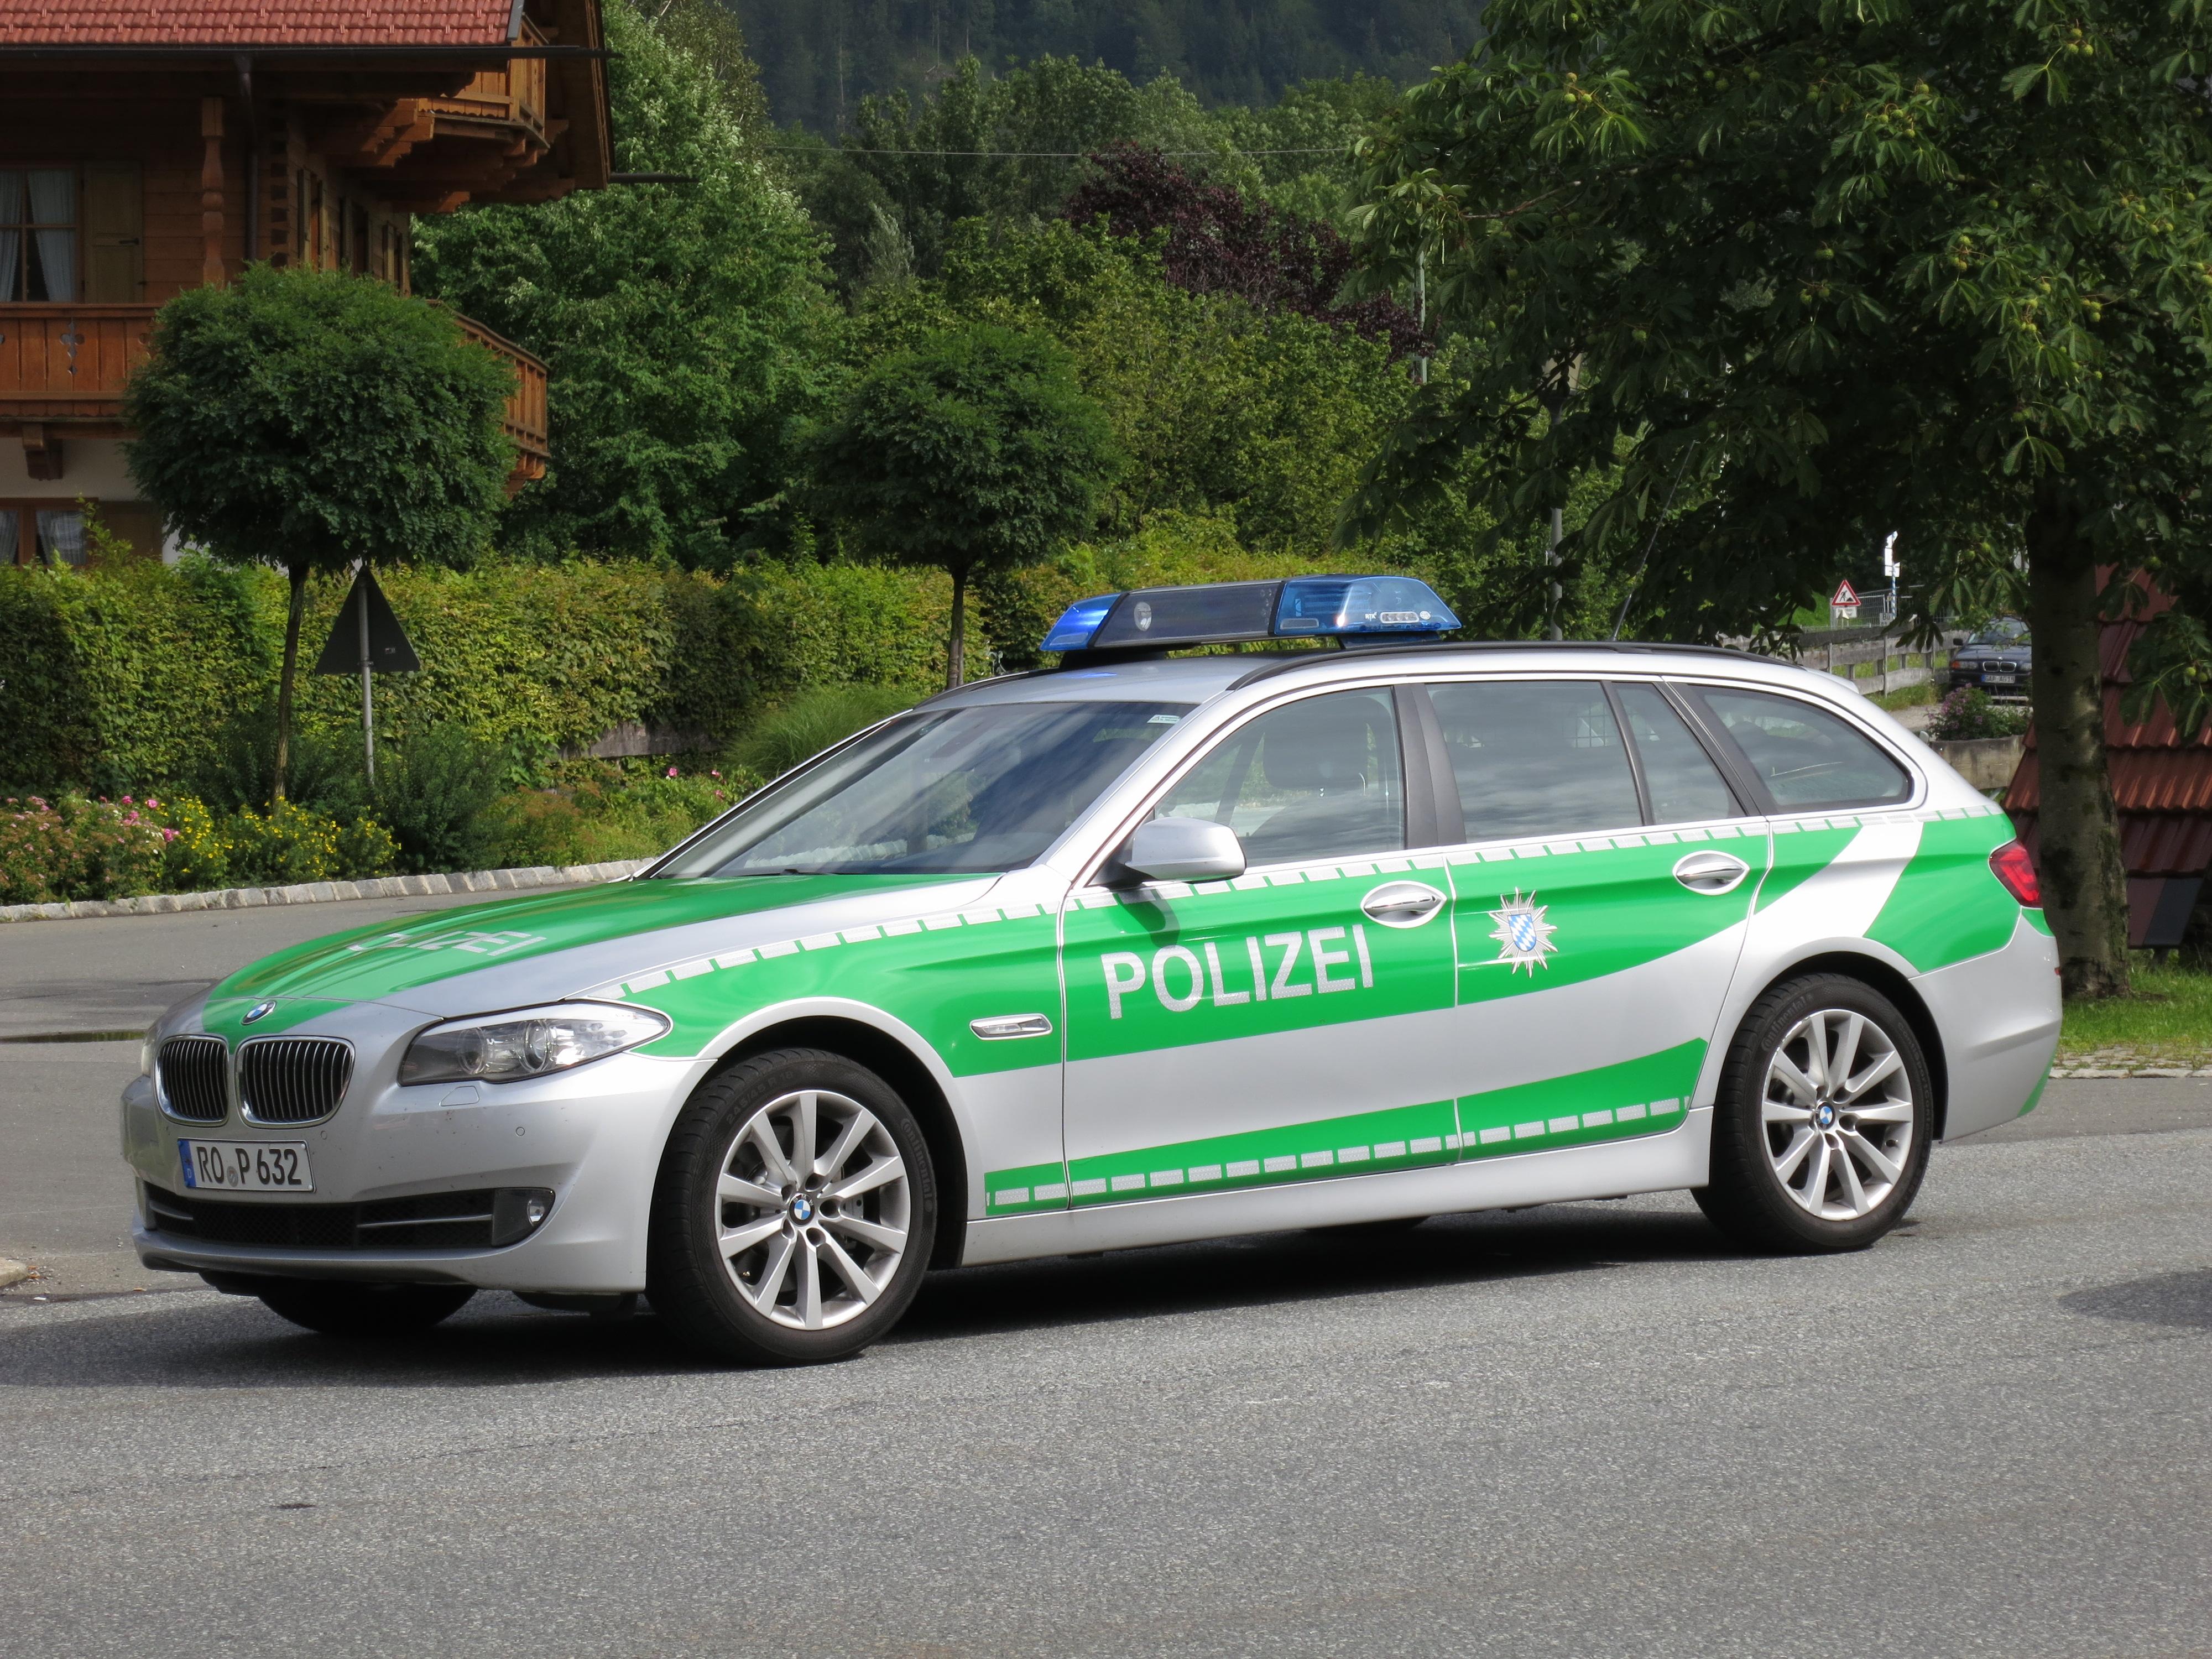 Cars Under 3000 >> File:5er BMW Polizei Bayern (7737915974).jpg - Wikimedia Commons